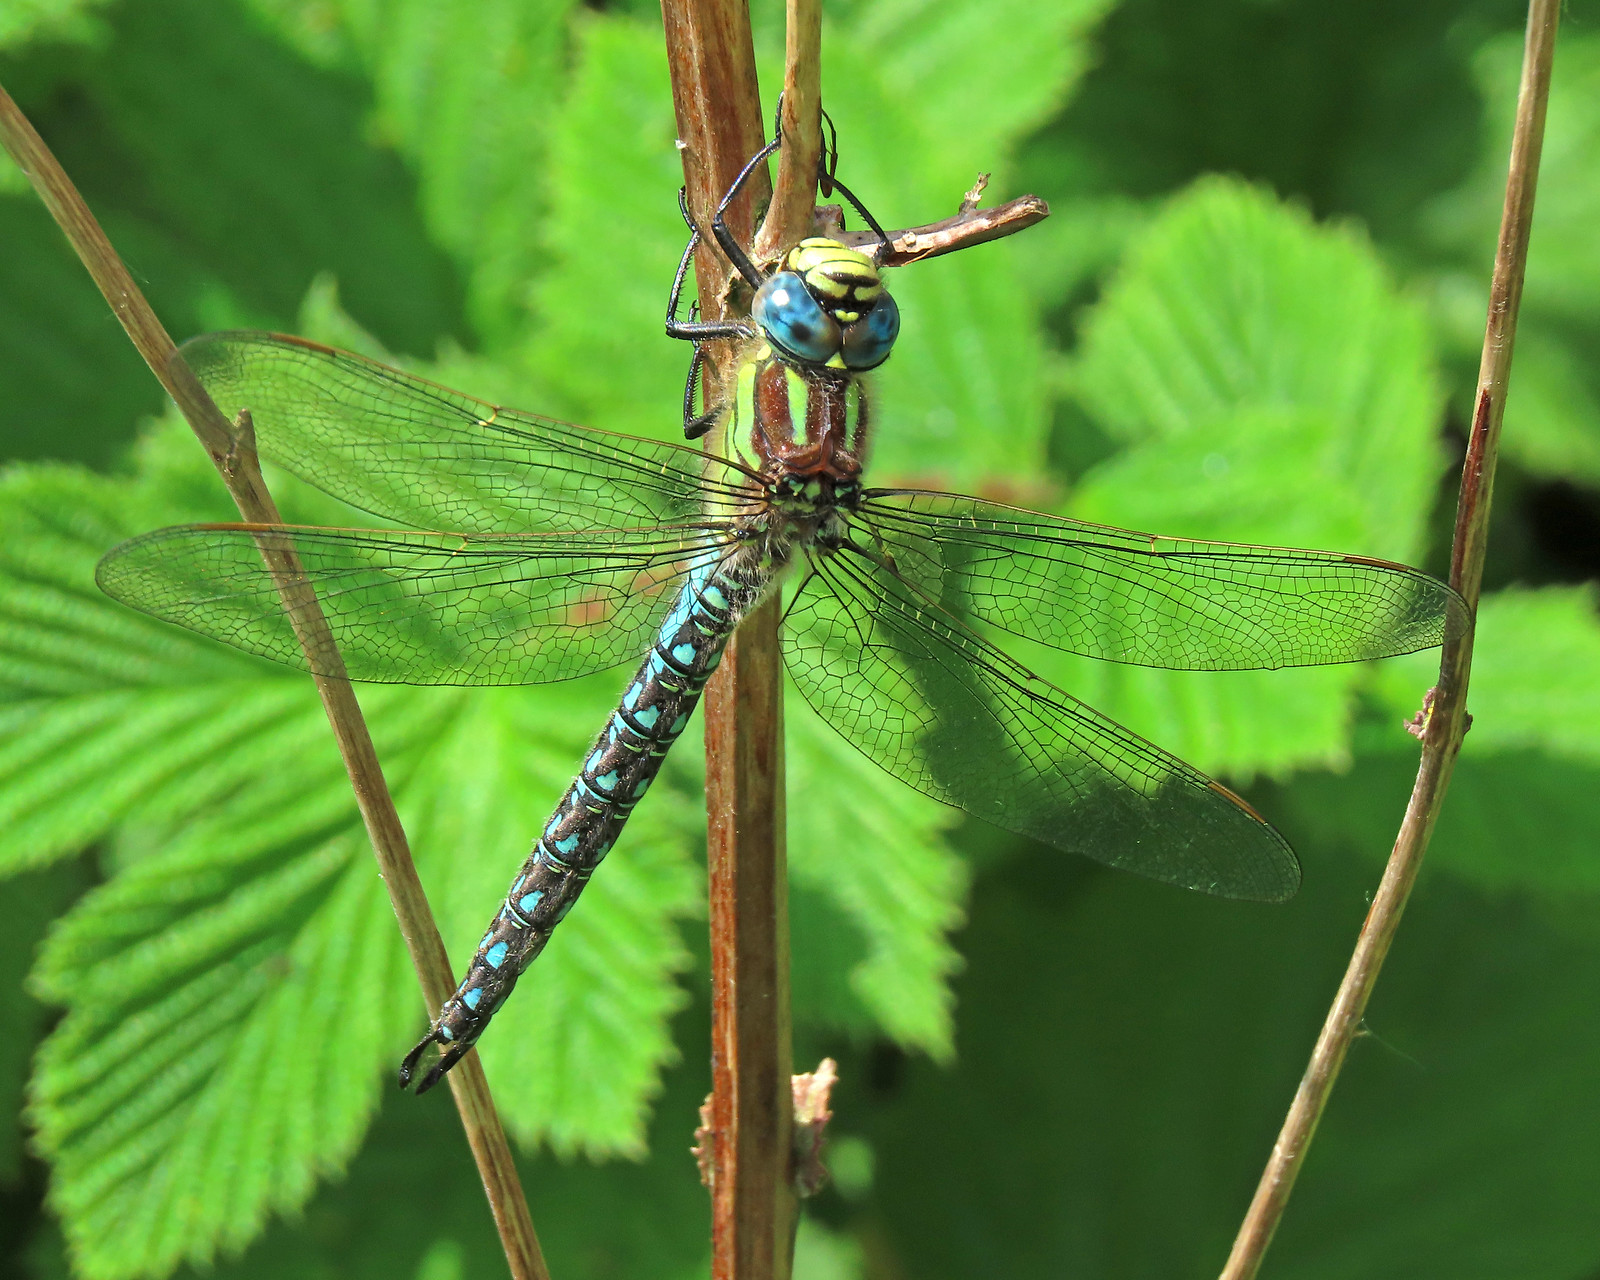 Hairy Dragonfly - Brachytron pratense